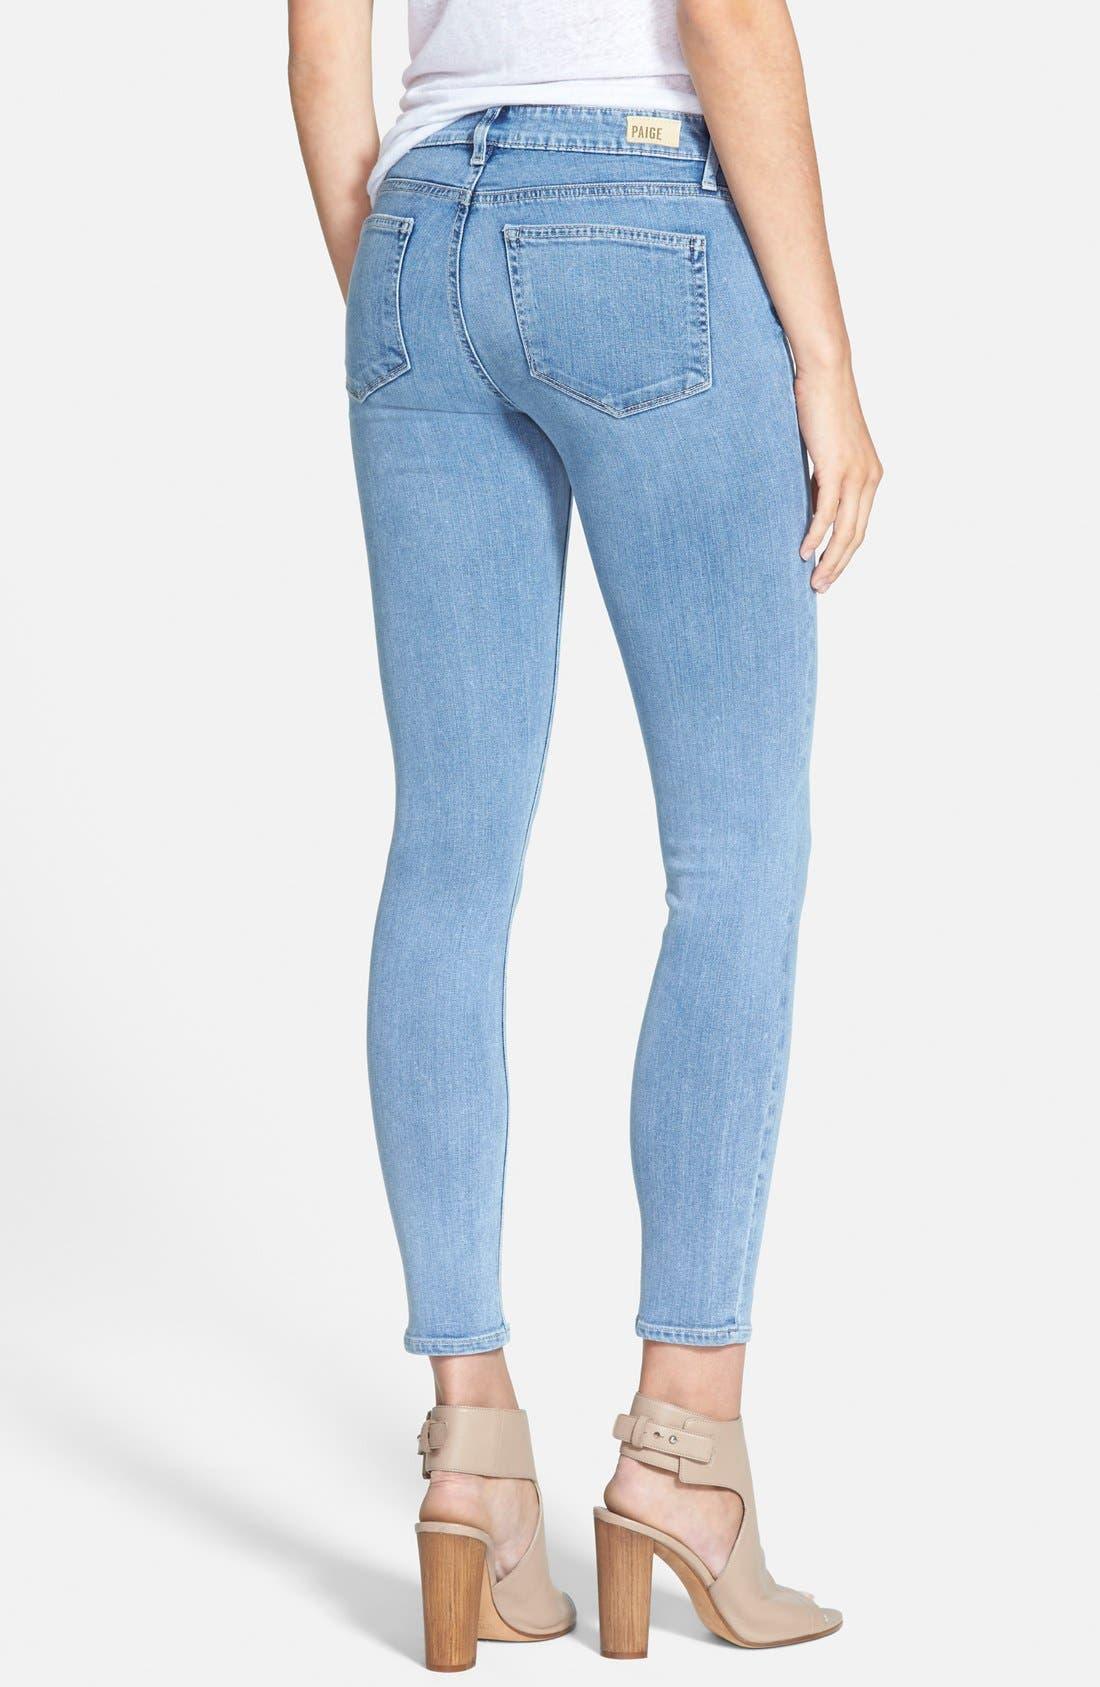 Alternate Image 2  - Paige Denim 'Transcend - Verdugo' Ankle Ultra Skinny Jeans (Joelle)